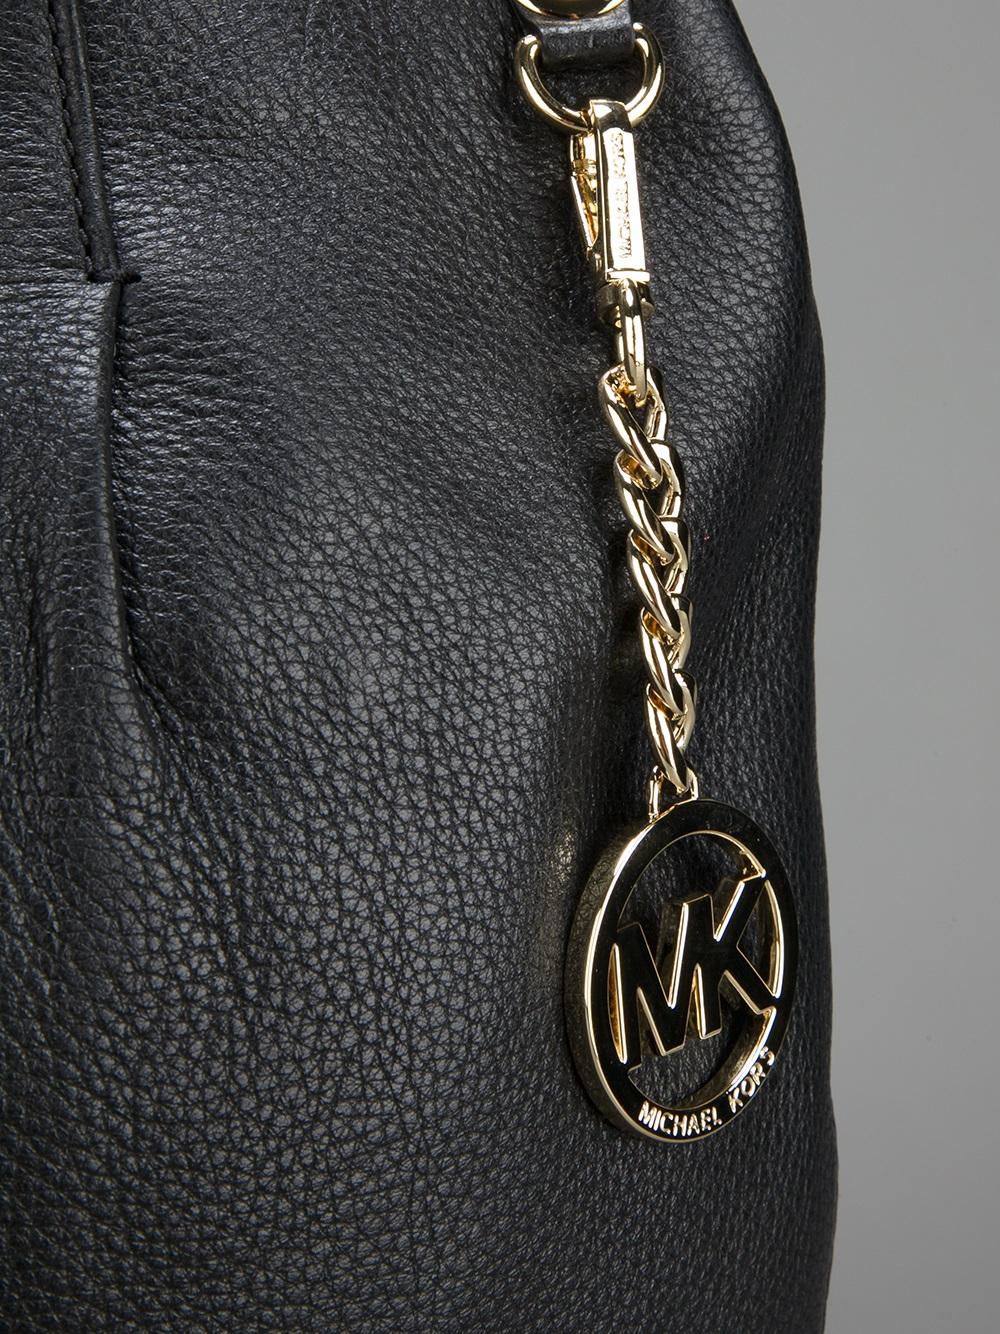 mk satchels grayson dodge valley rh legrenierdemelanie com